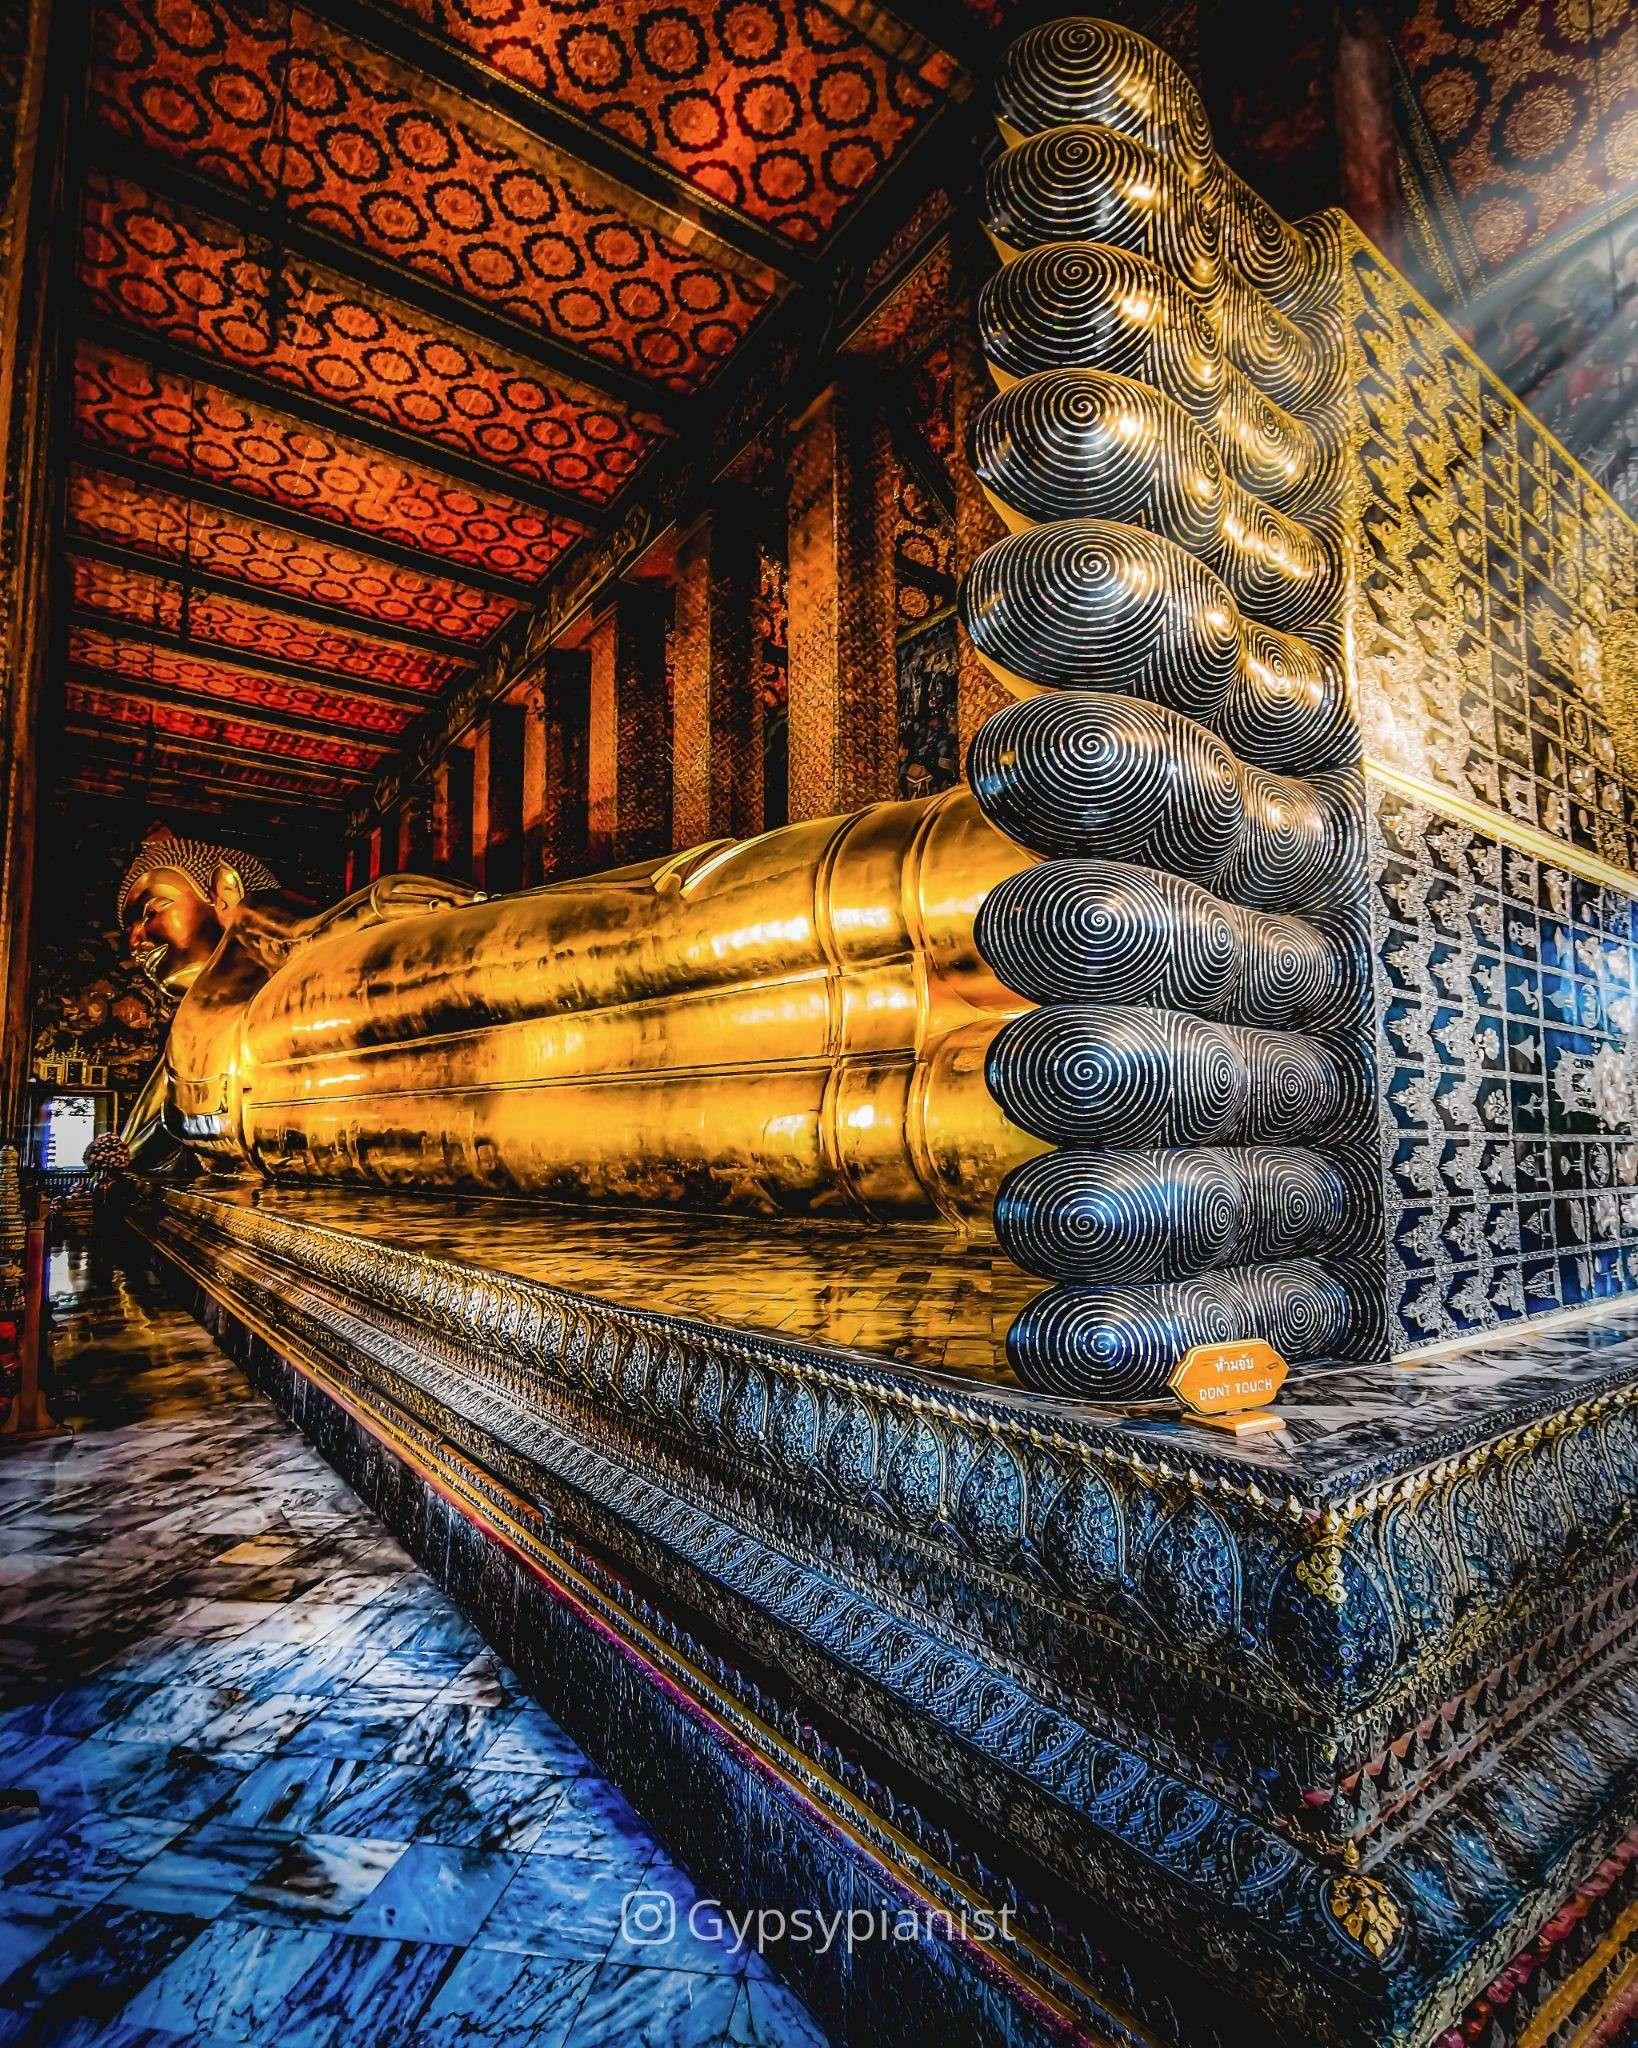 The reclining Buddha at the Wat Pho temple in Bangkok